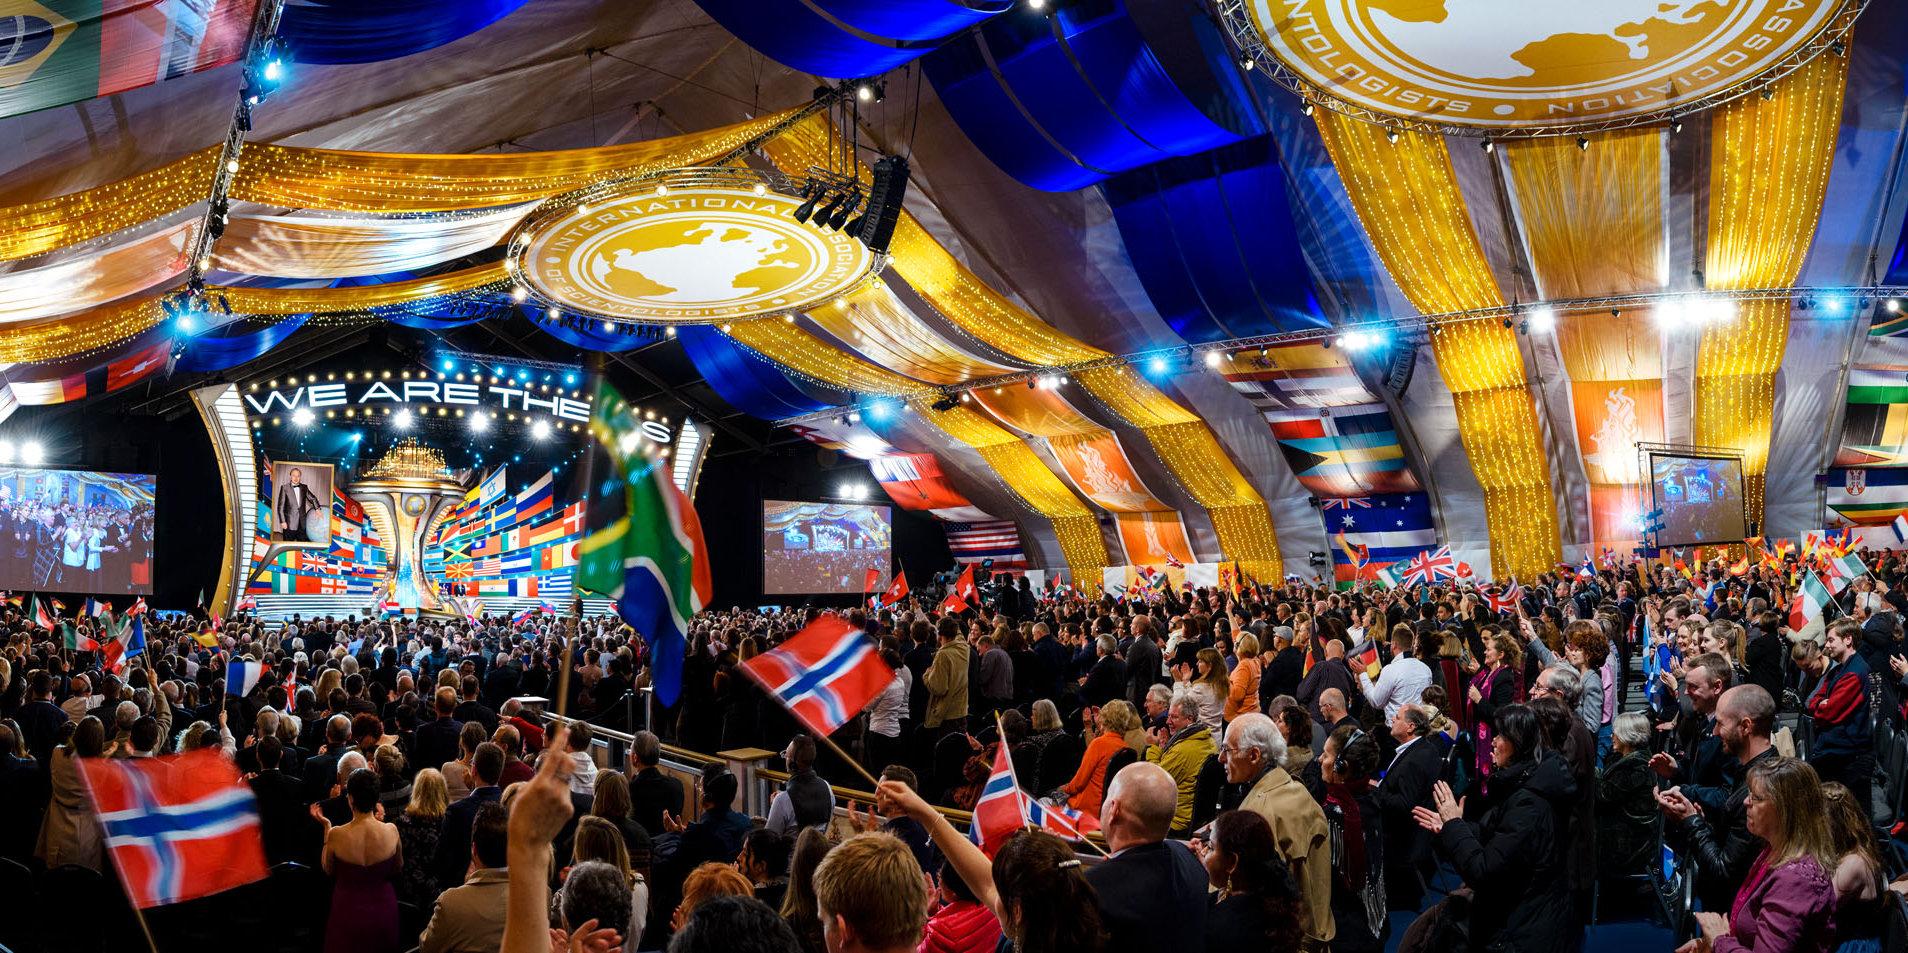 Internationella scientologförbundets jubileum